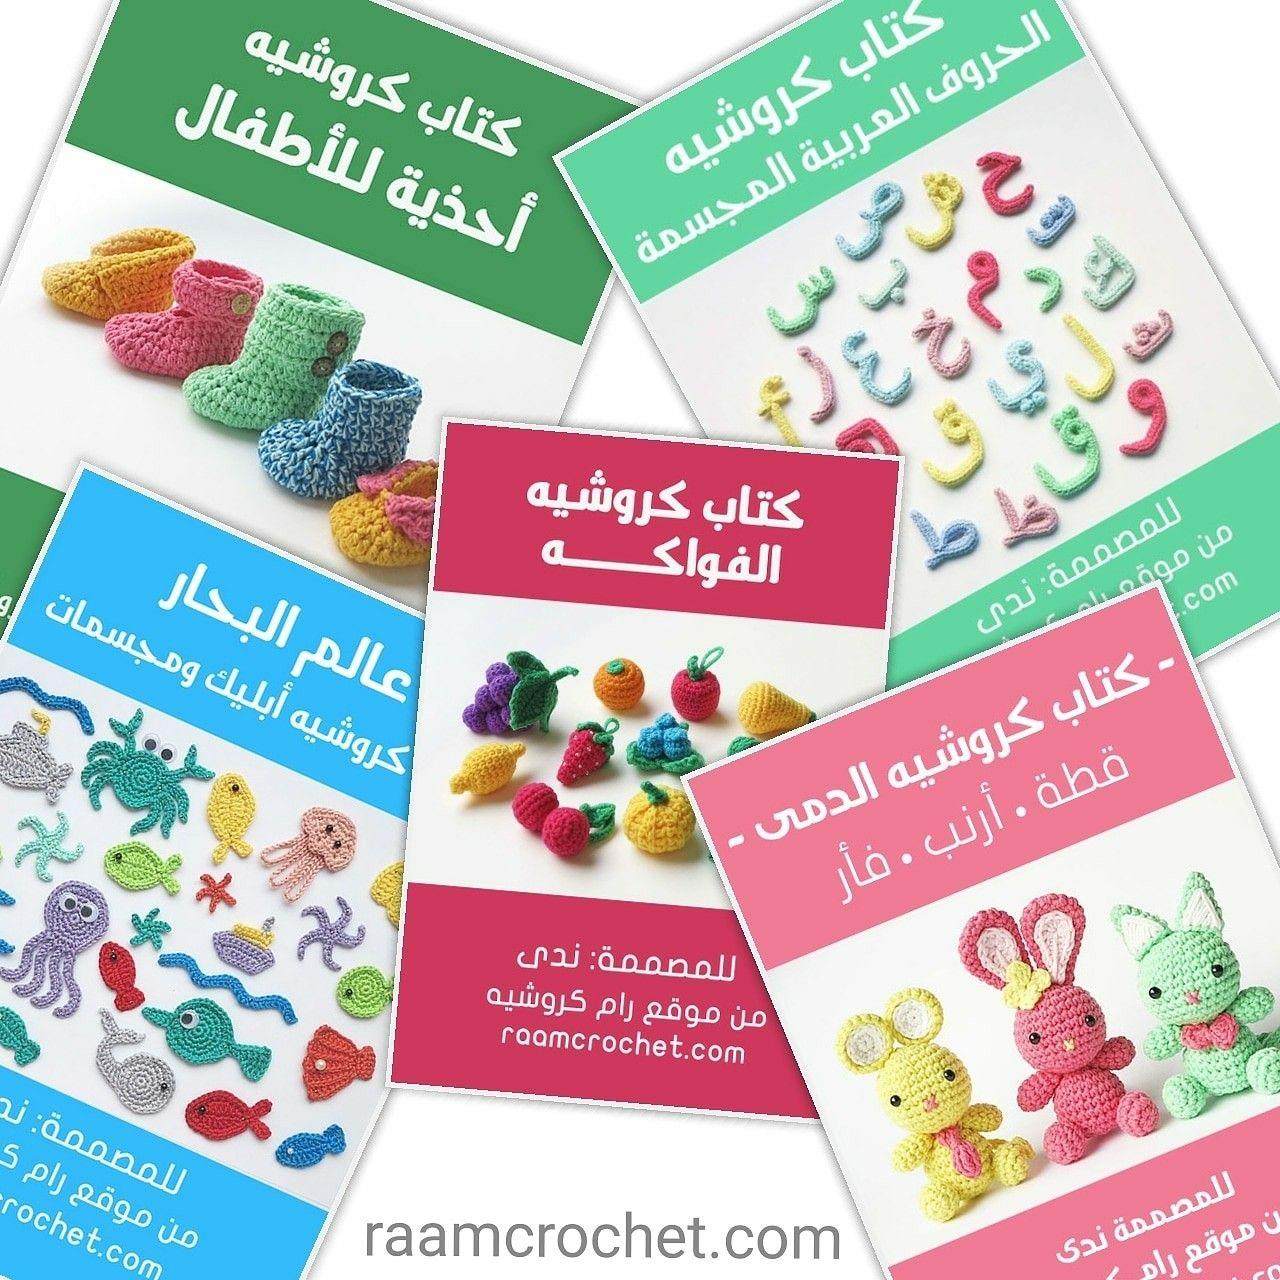 644e7cfe4 الكتب إلكترونية بصيغة بي دي اف للتحميل متوفرة في متجر رام كروشيه على الرابط  التالي .